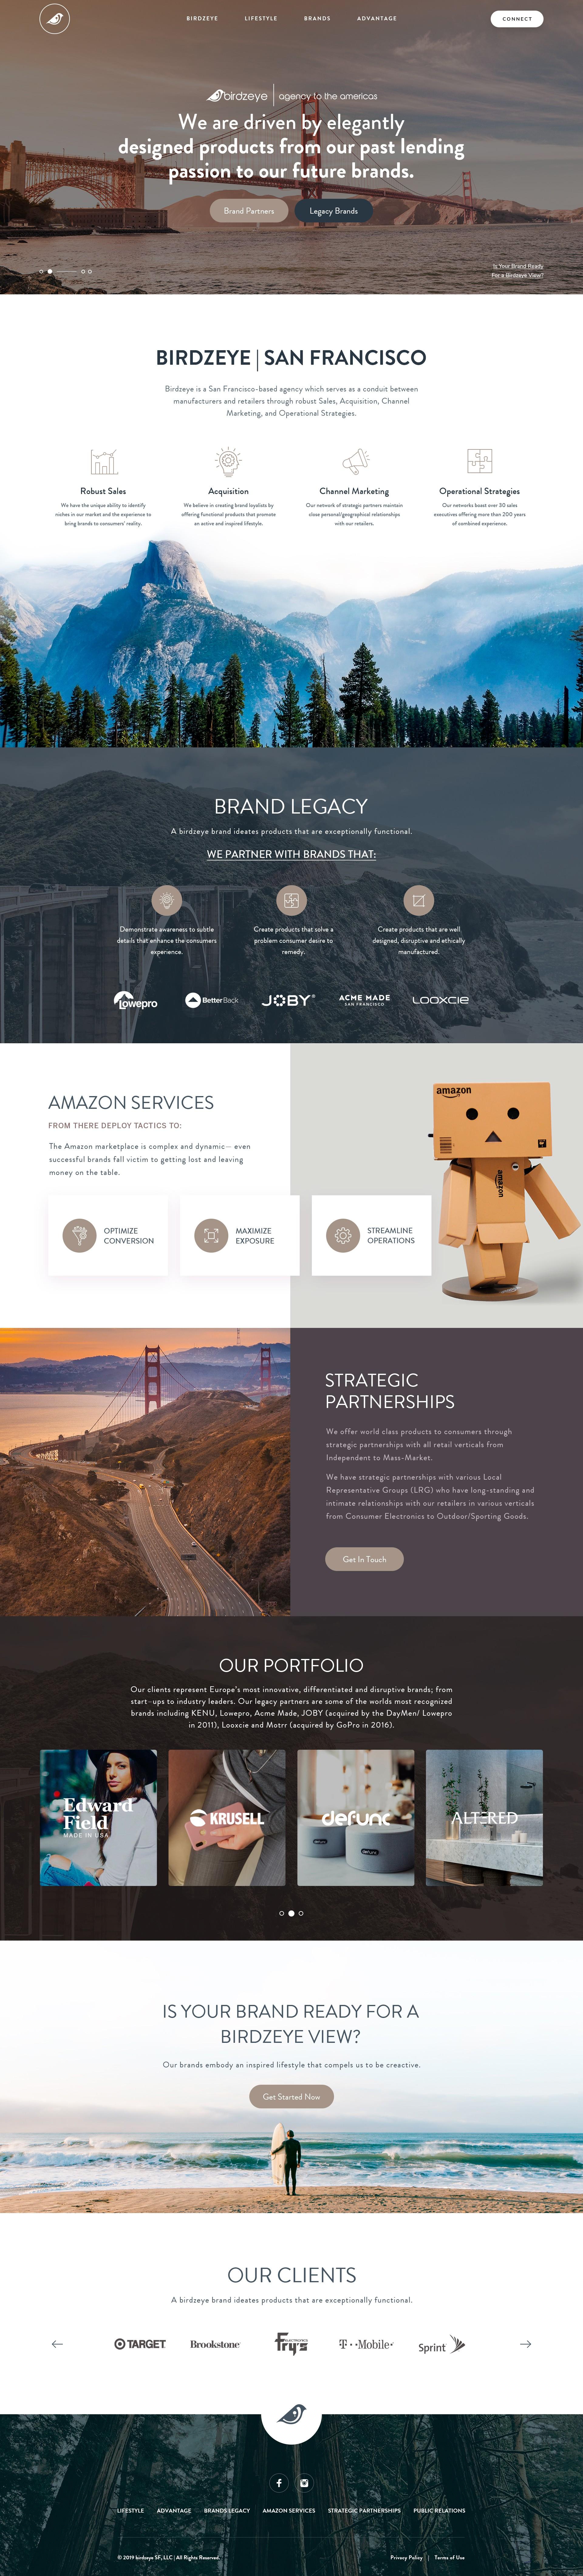 Birdzeye SF | agency of the americas | NEW WEBSITE DESIGN & CODING LIVE ONLINE